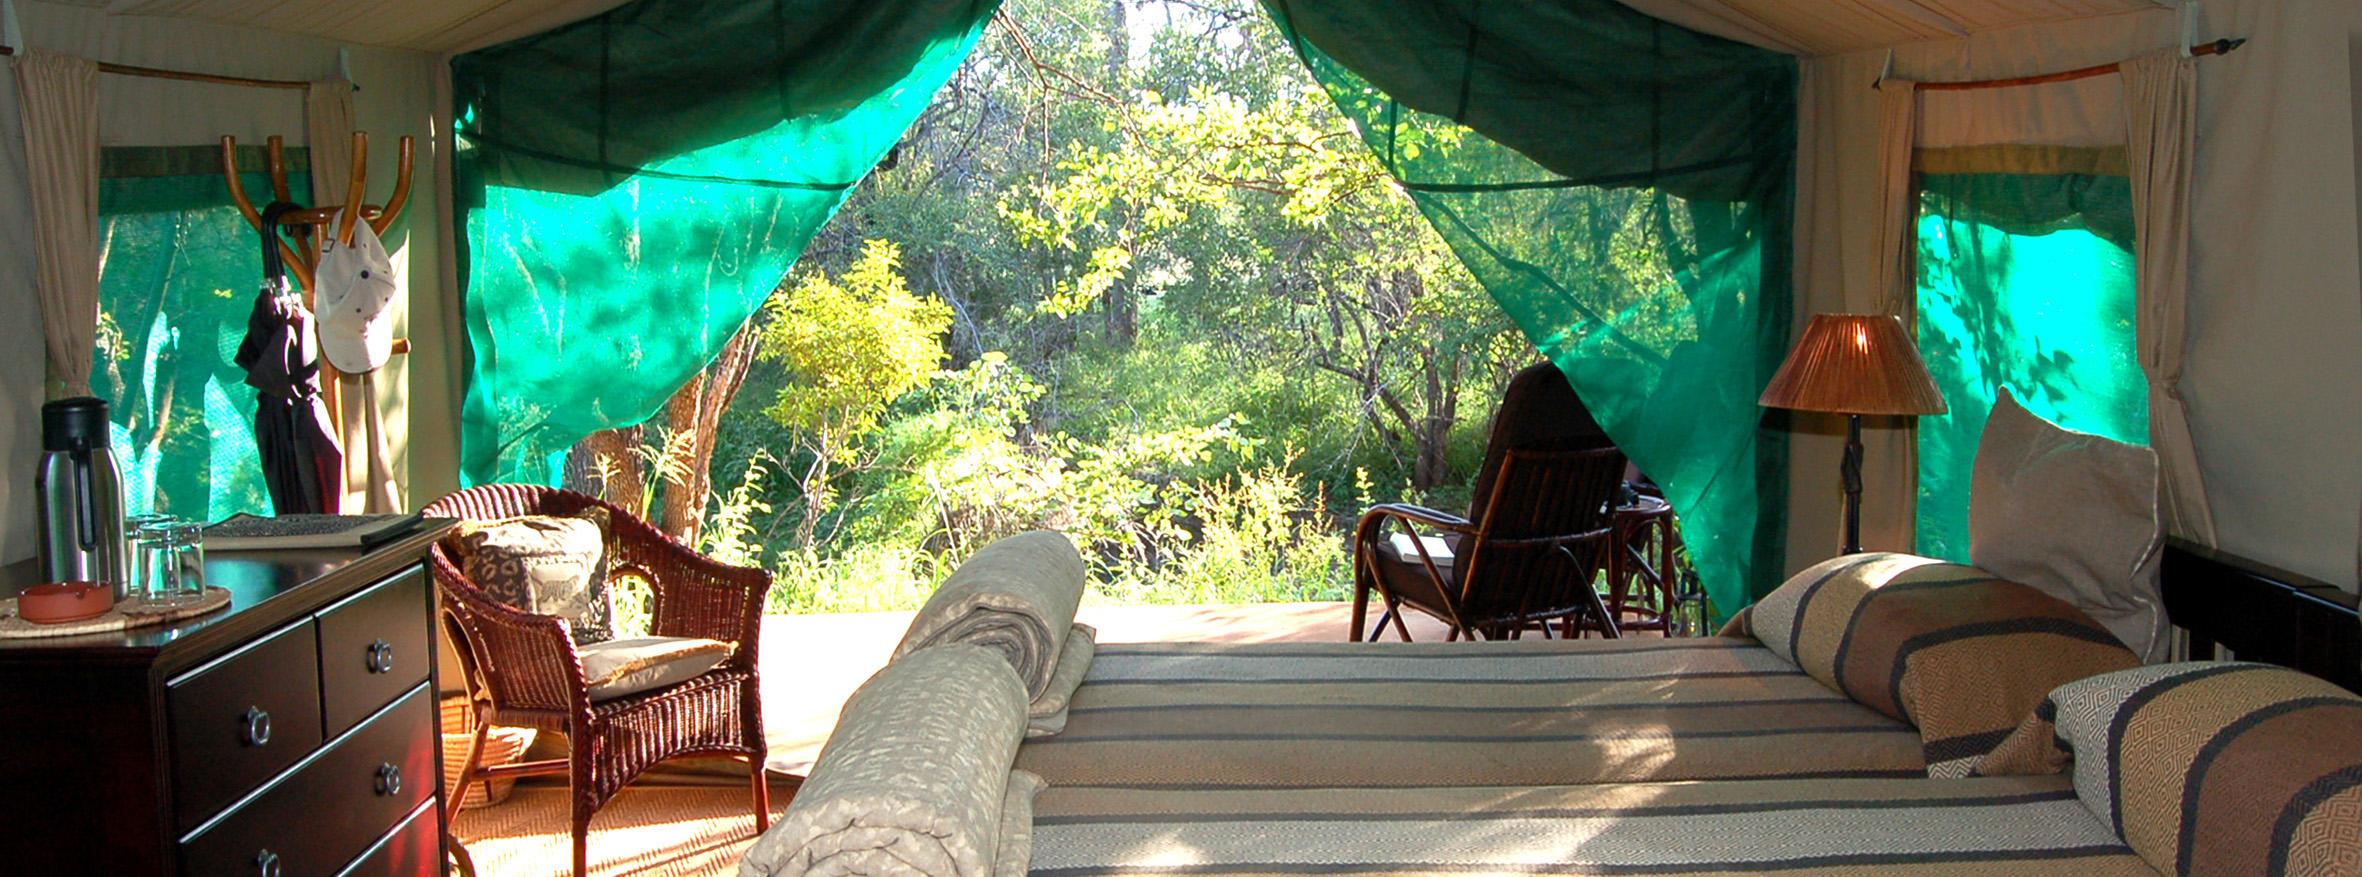 Mashatu_Tented_Camp_S_BSC_15